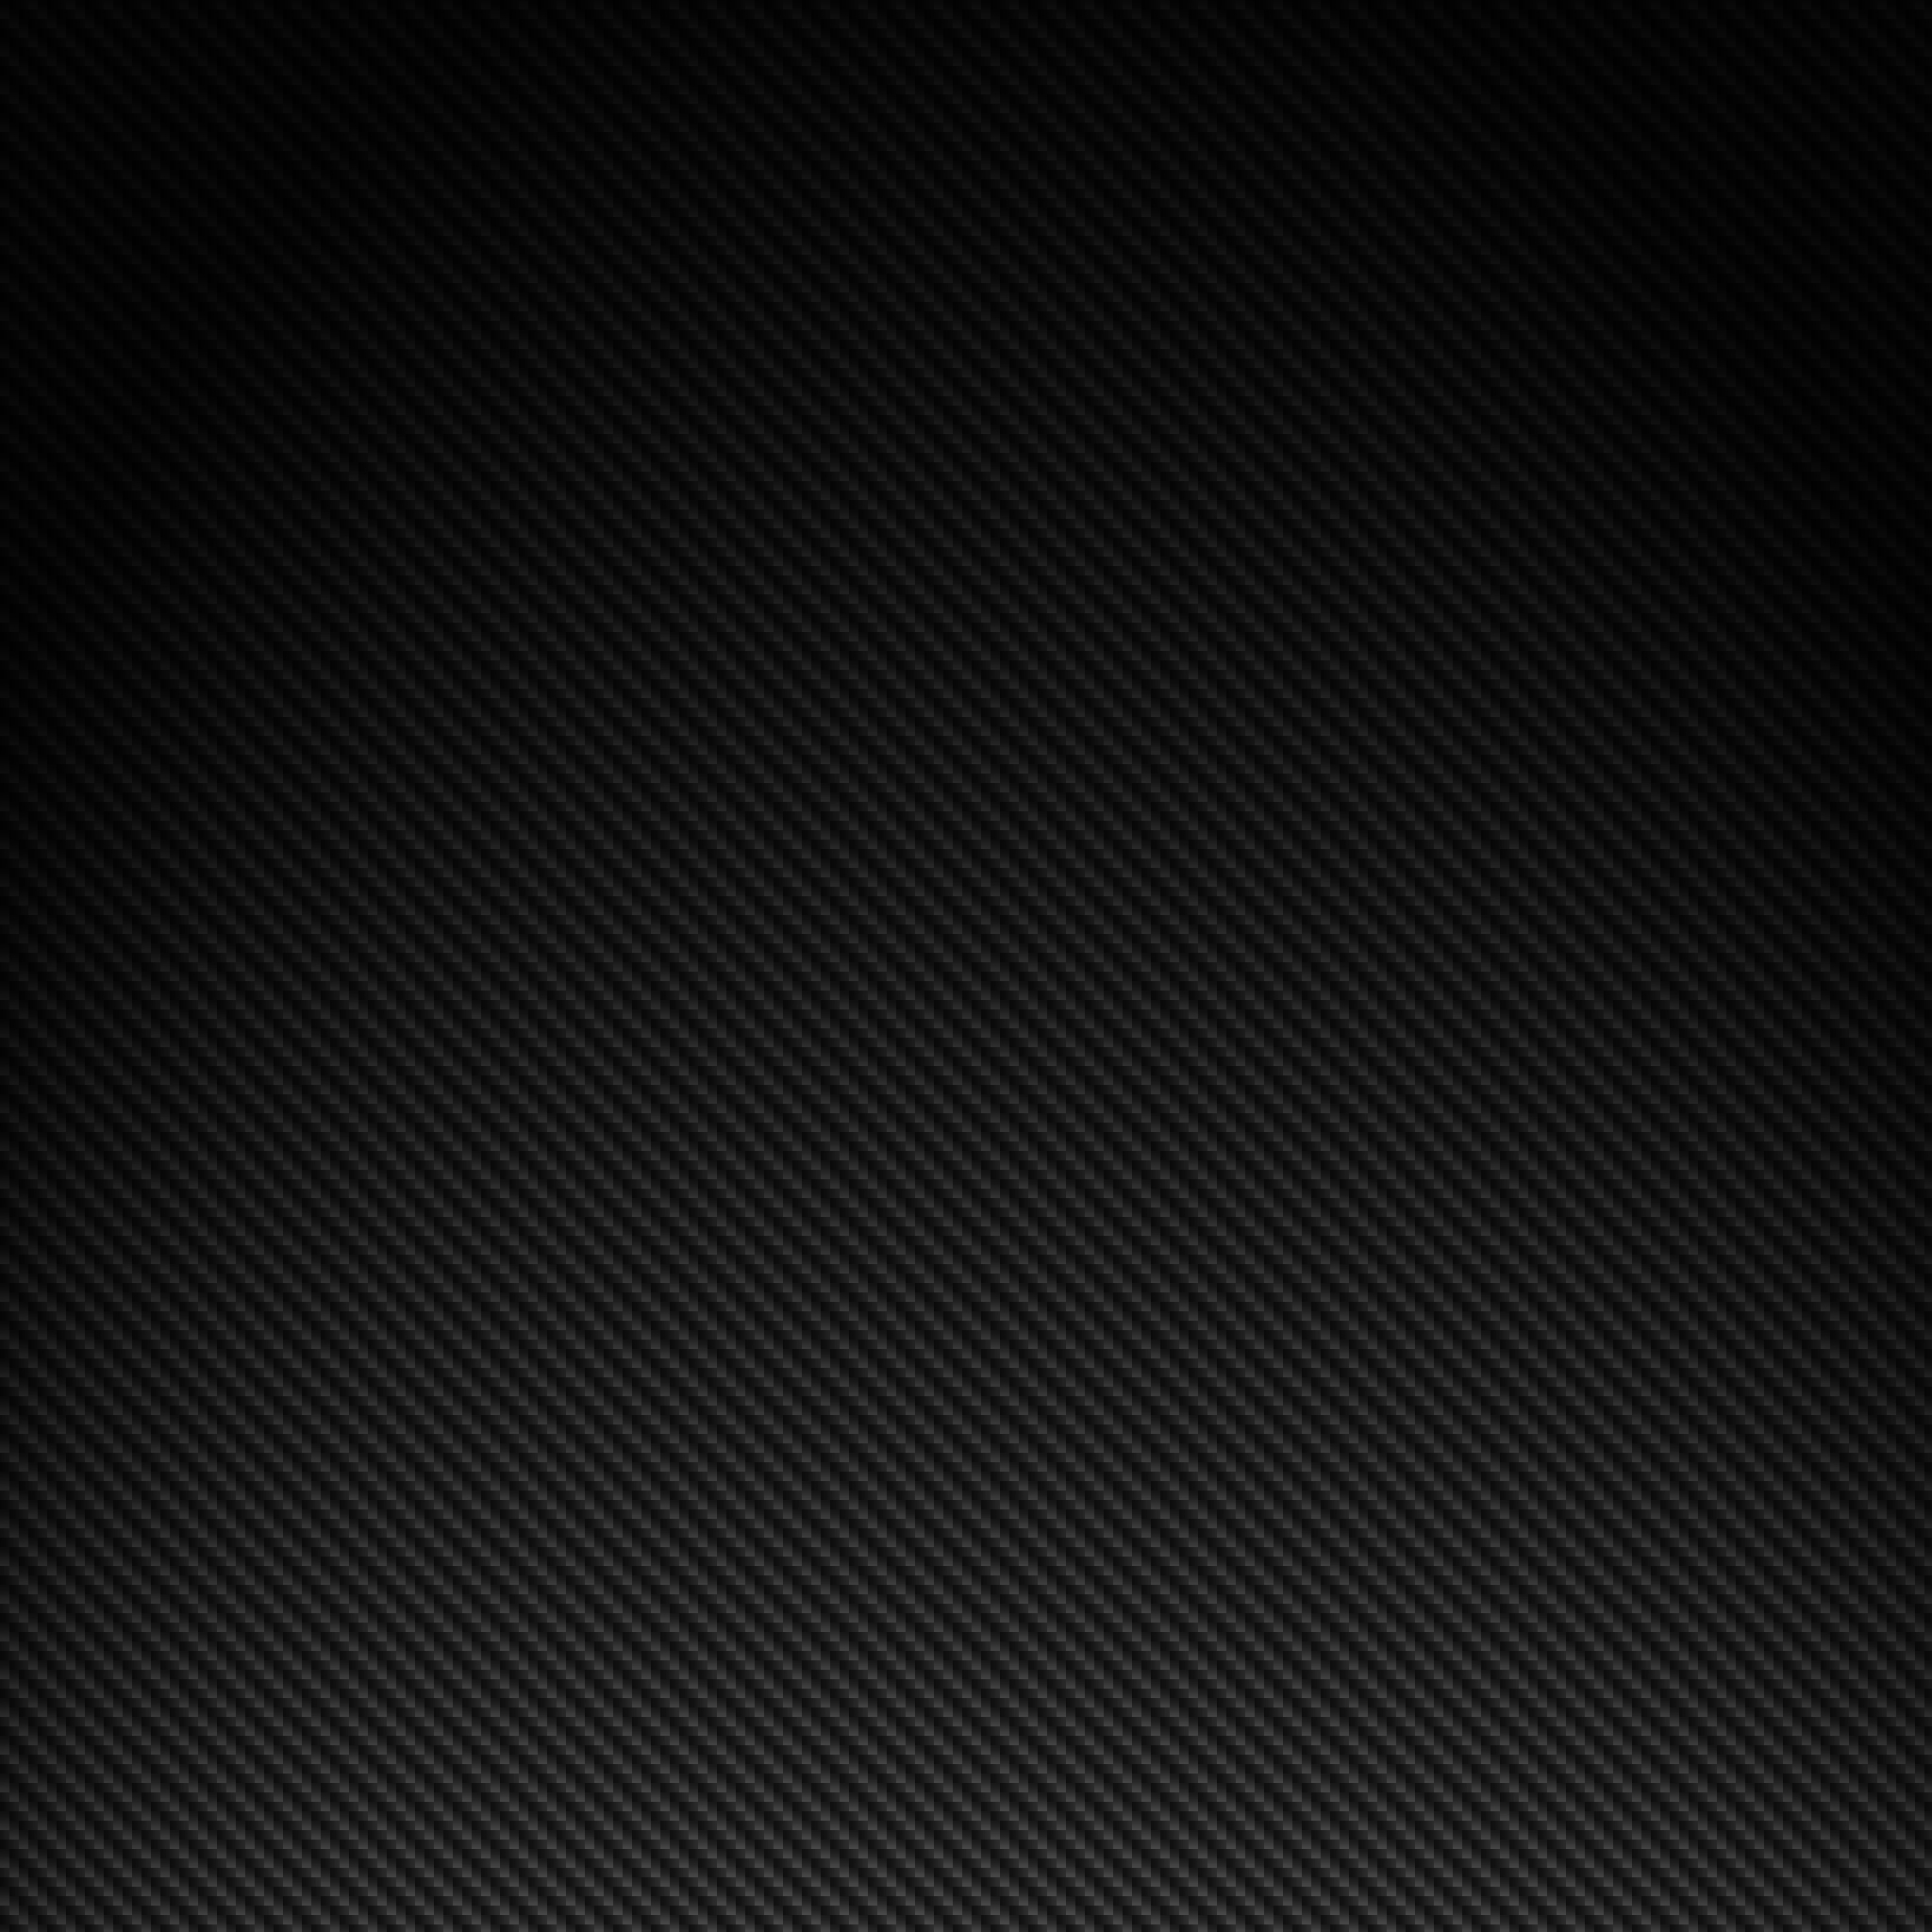 free high resolution carbon fiber wallpaper for new ipad | ebin